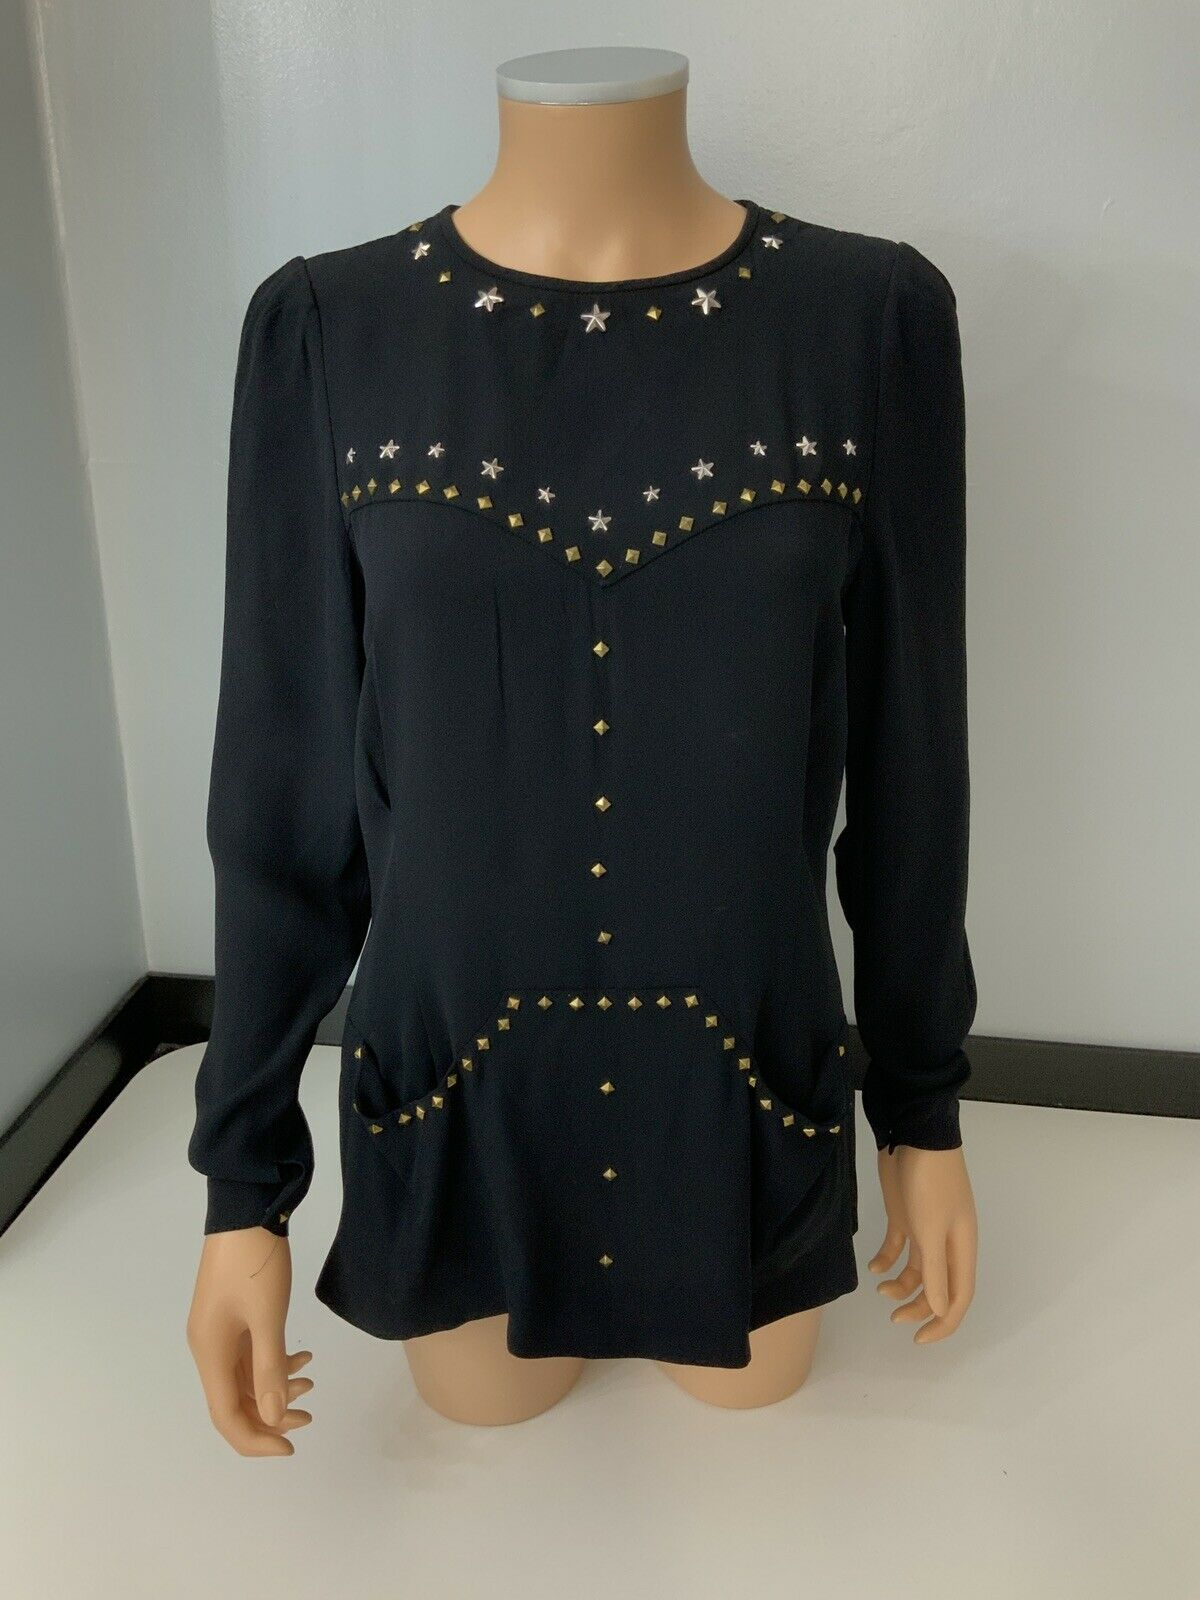 Isabel Marant Blouse Blouse Blouse Long Sleeve Größe 38 Uk 10 Long Sleeved VGC Studs 5c2